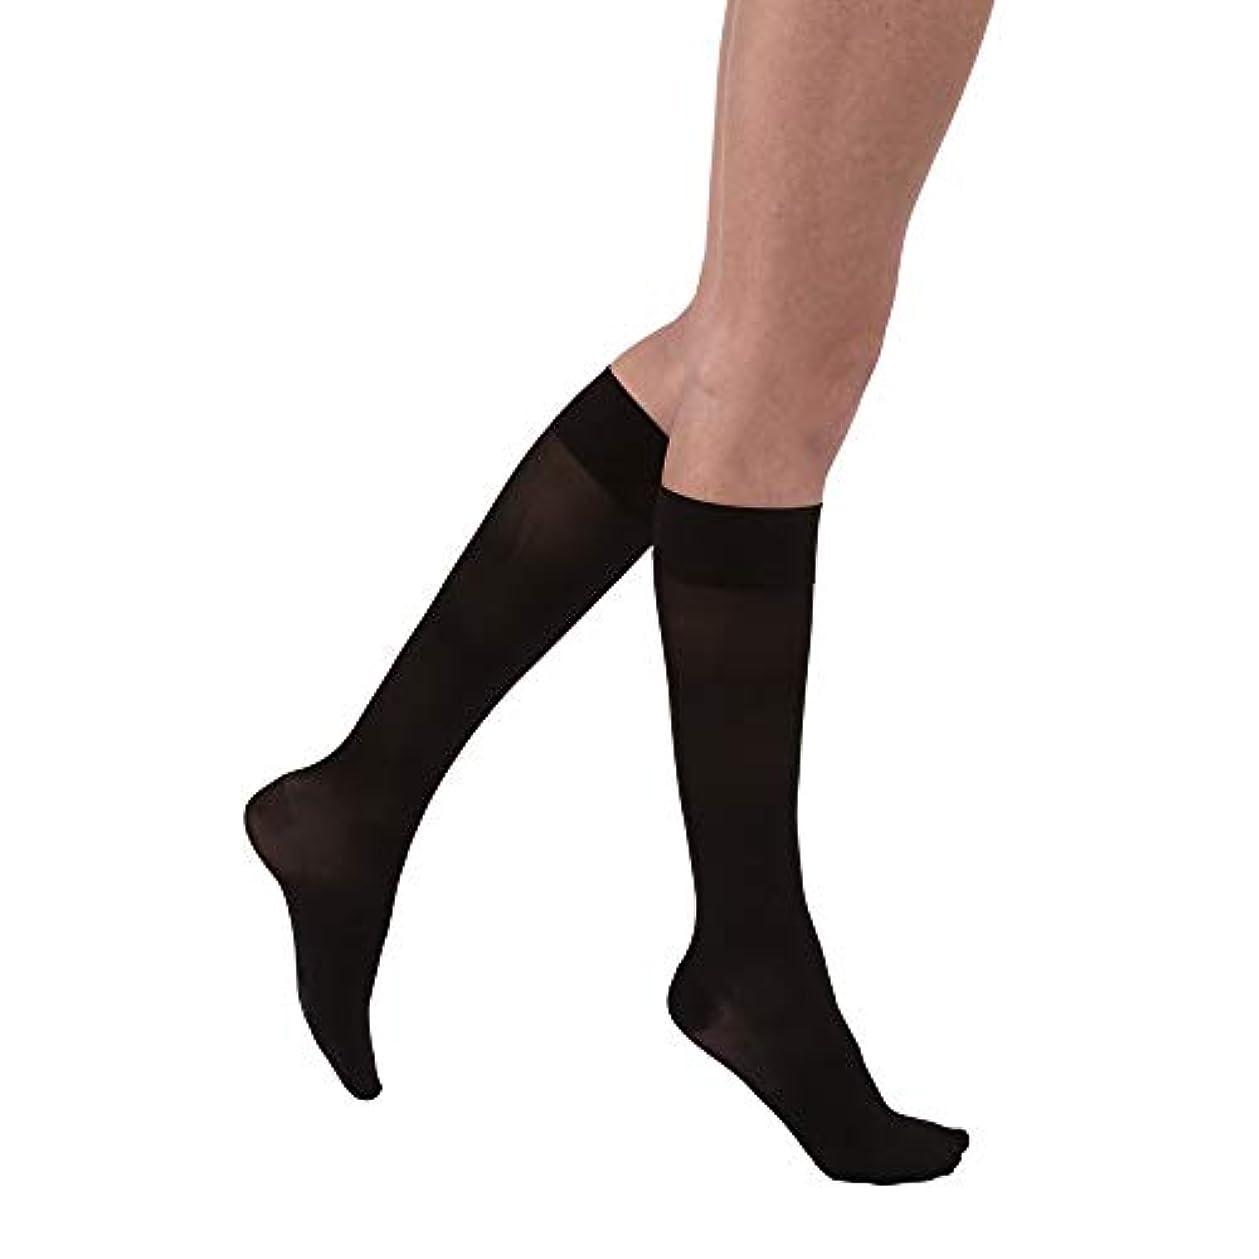 Jobst 119625 Ultrasheer Knee Highs PETITE 30-40 mmHg - 15 in. or less - Size & Color- Classic Black Medium